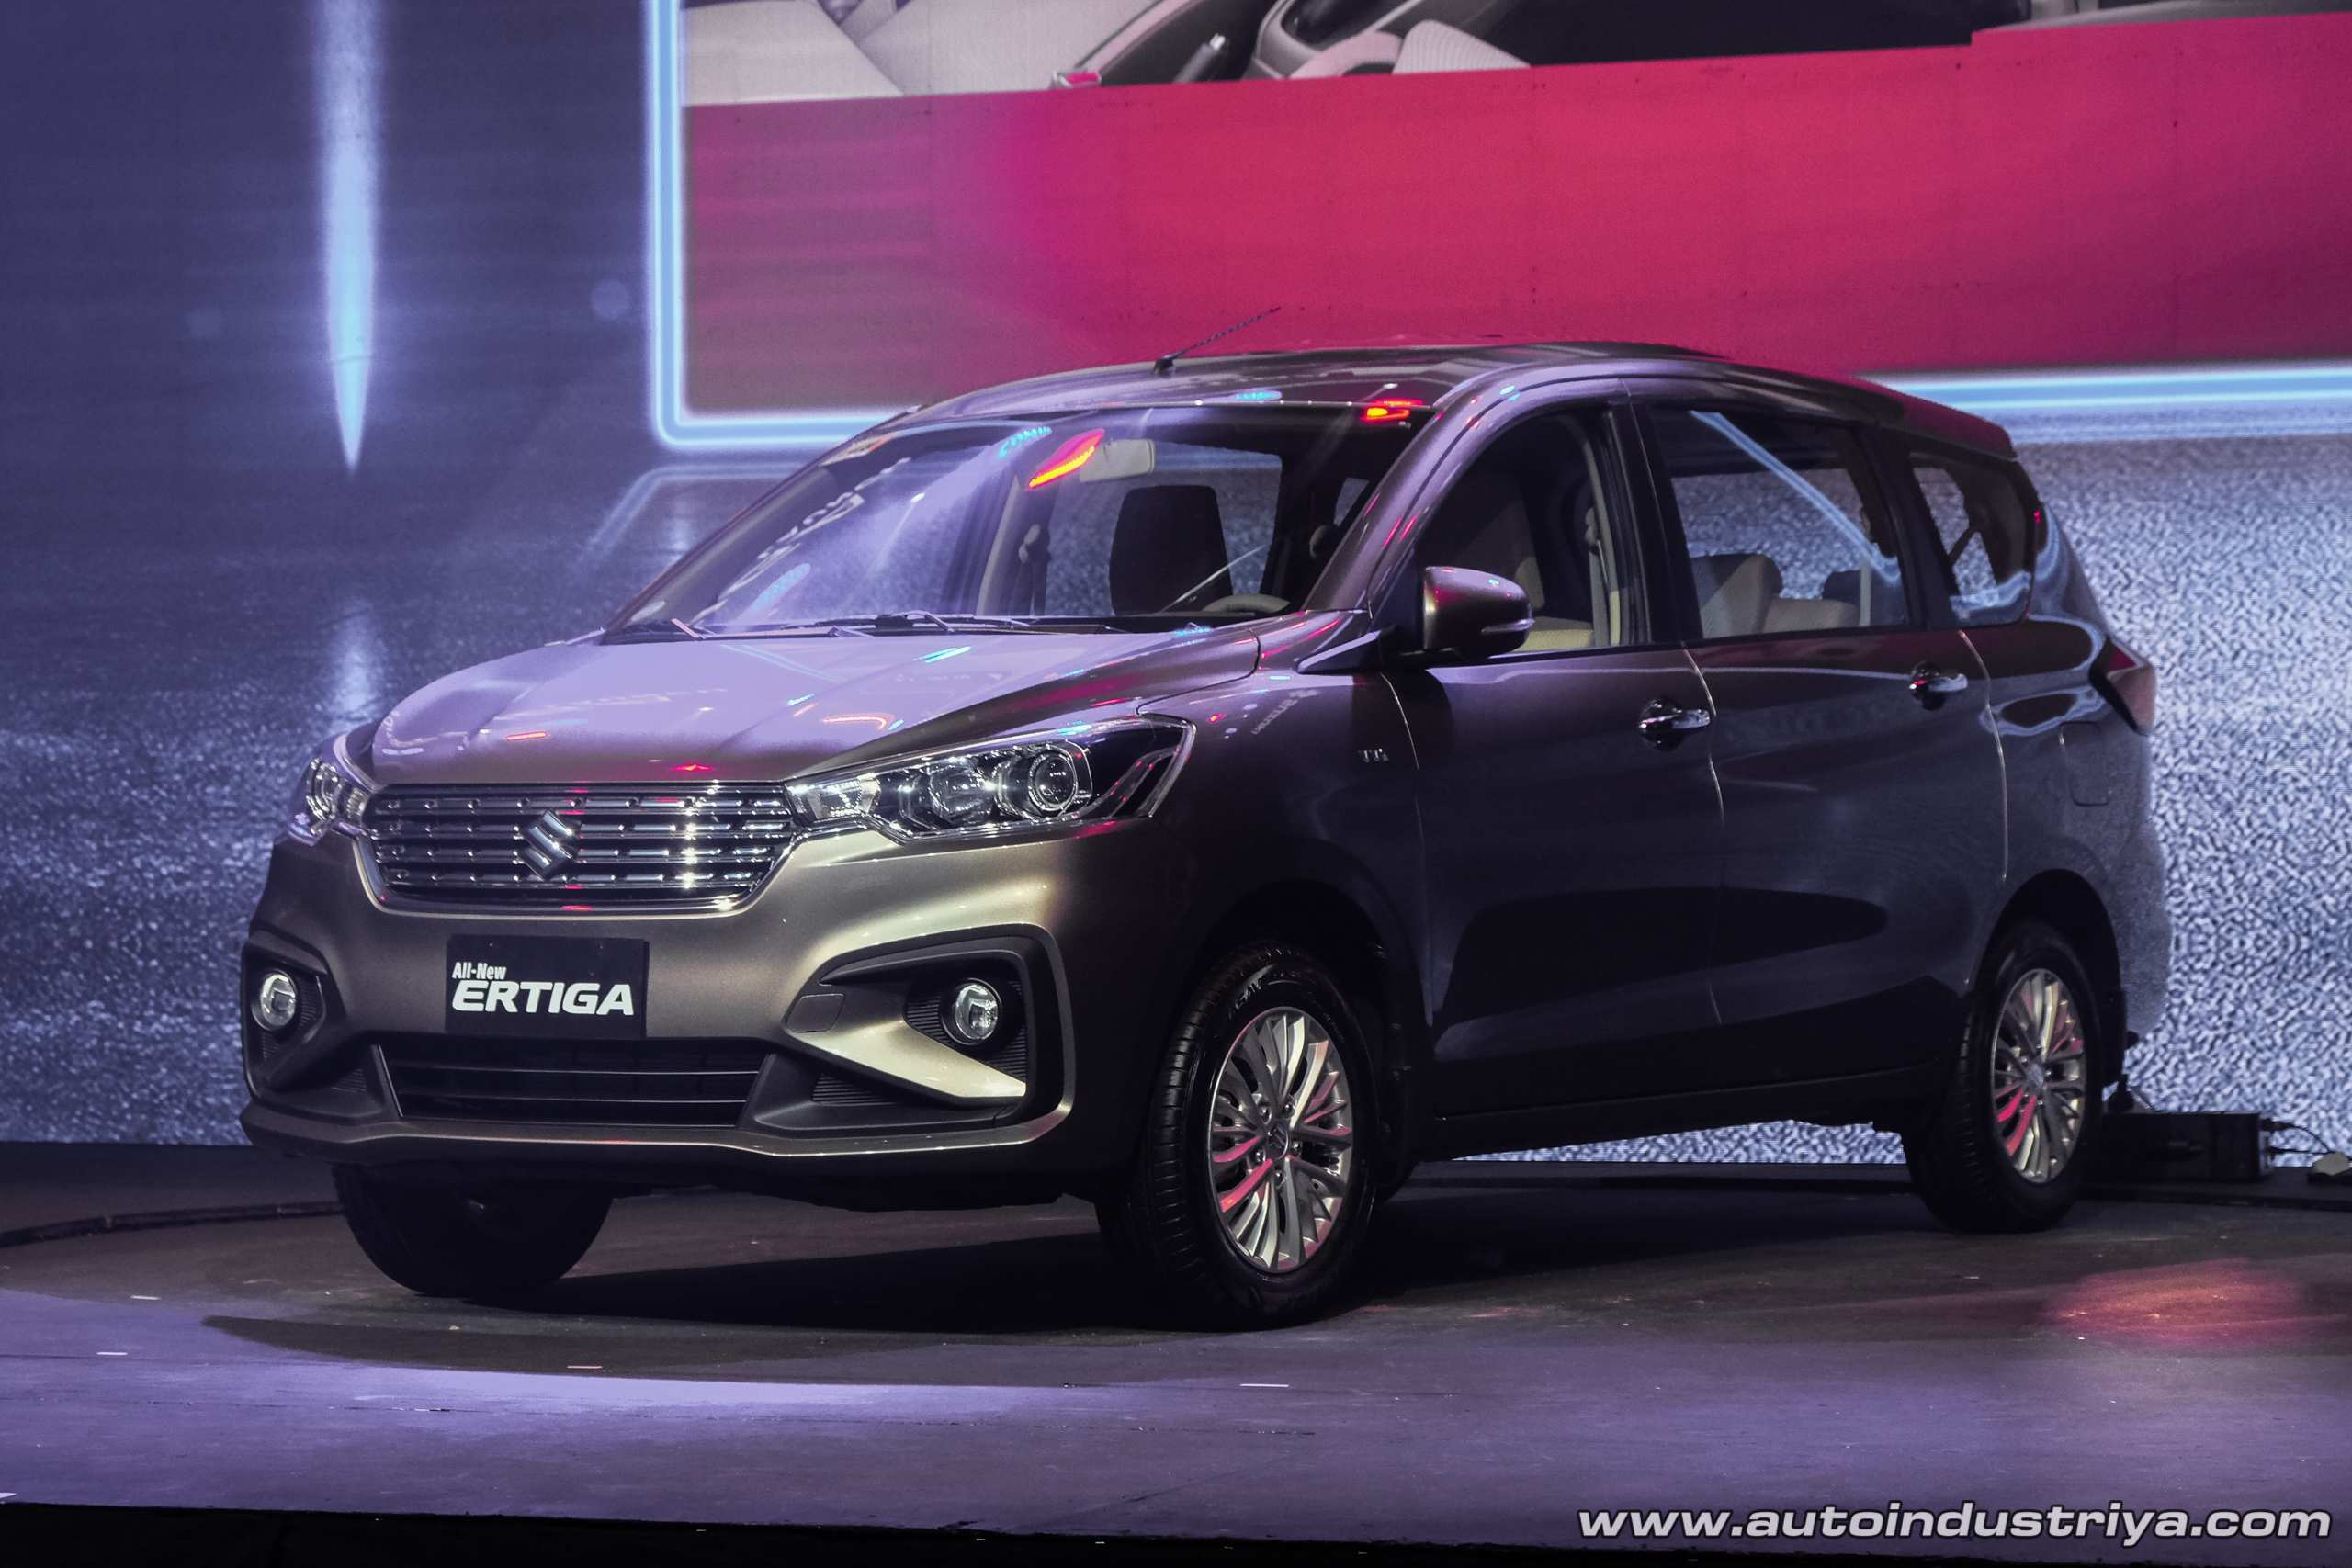 65 Concept of 2019 Suzuki Ertiga History for 2019 Suzuki Ertiga